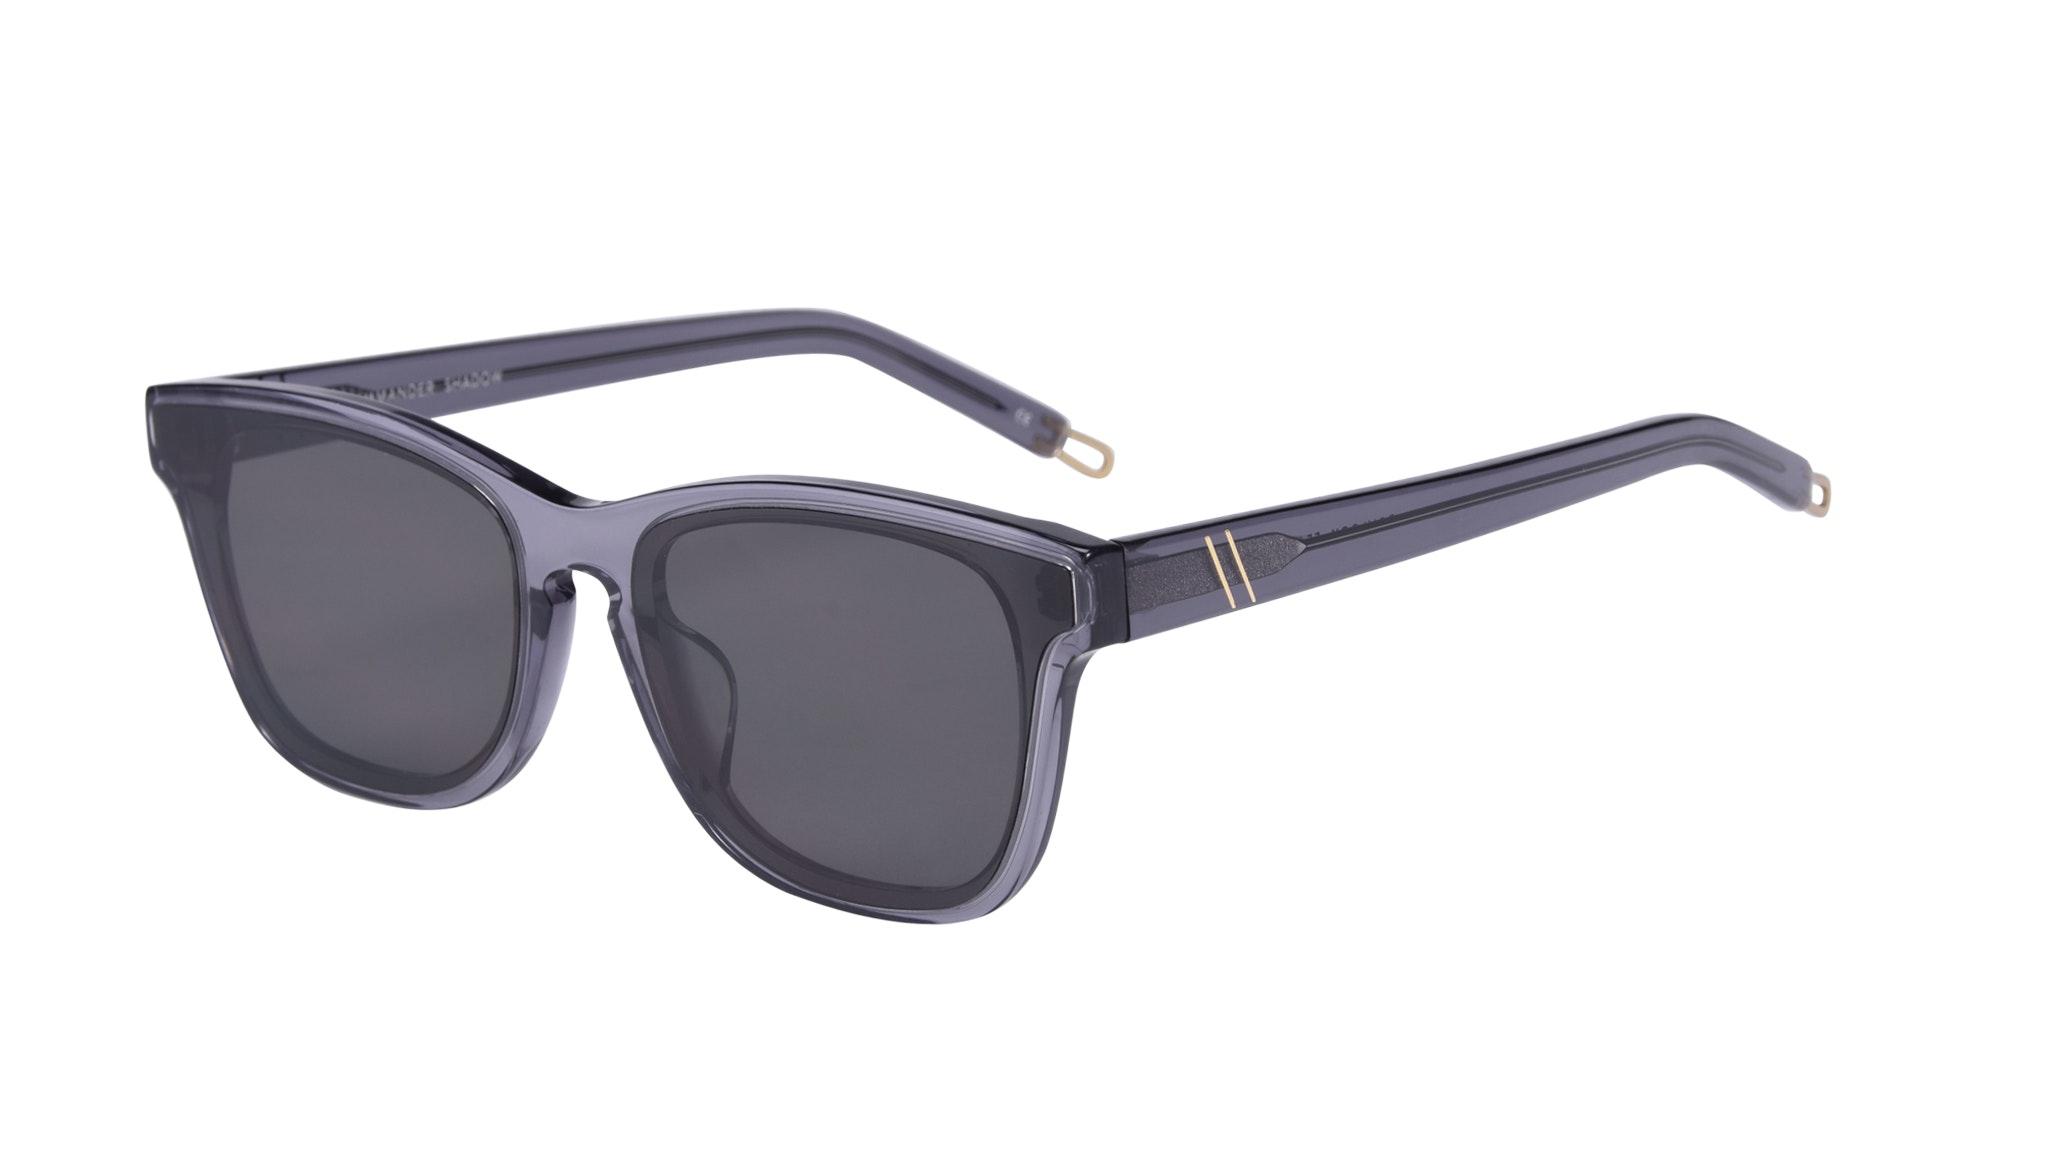 Affordable Fashion Glasses Square Sunglasses Men Commander Shadow Tilt